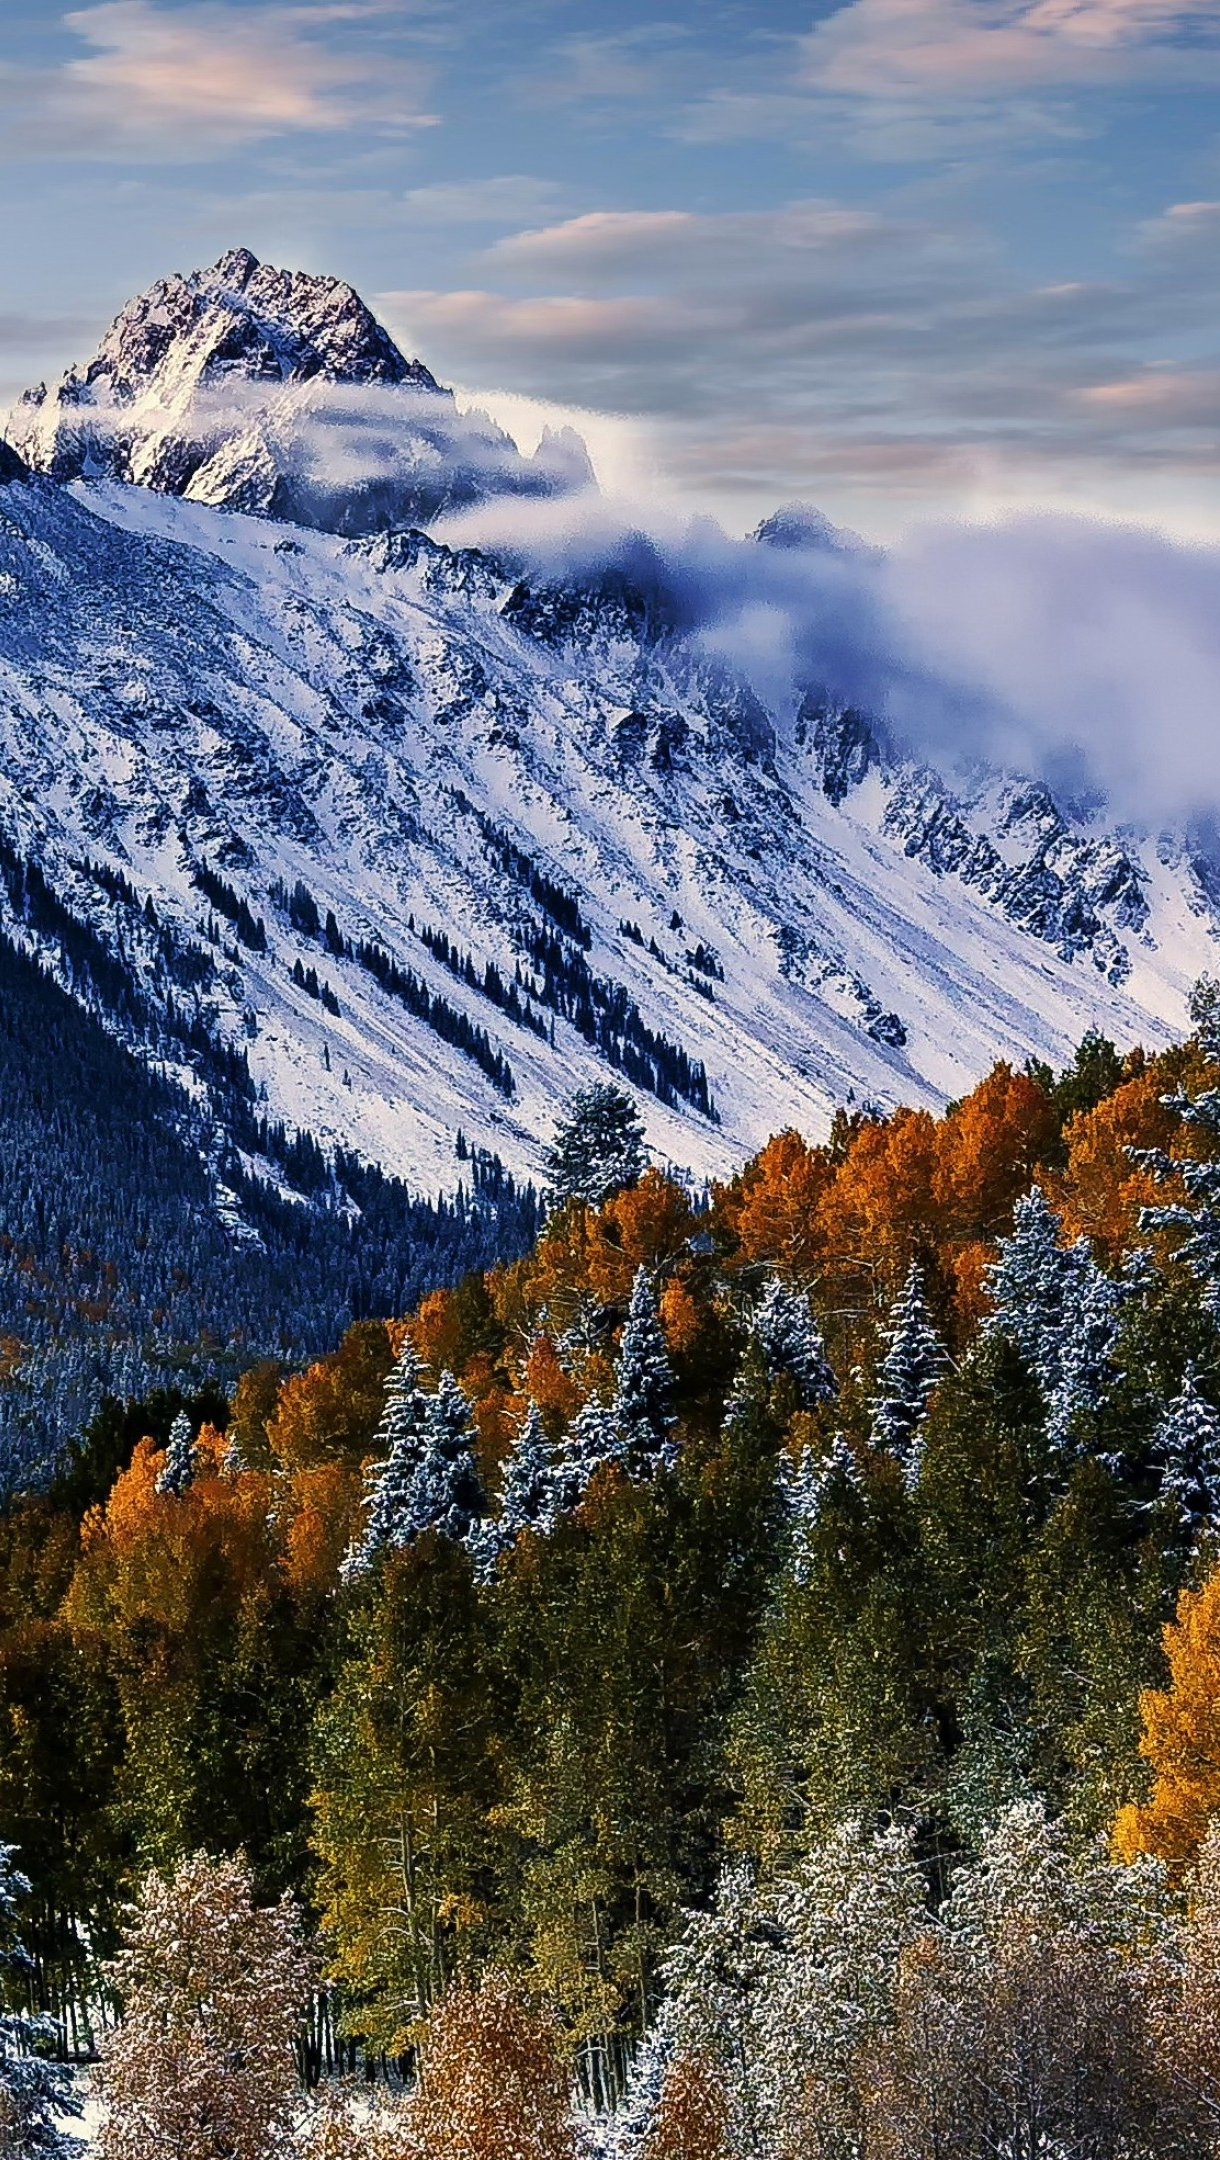 Wallpaper Mountains in Sneffels forest Vertical